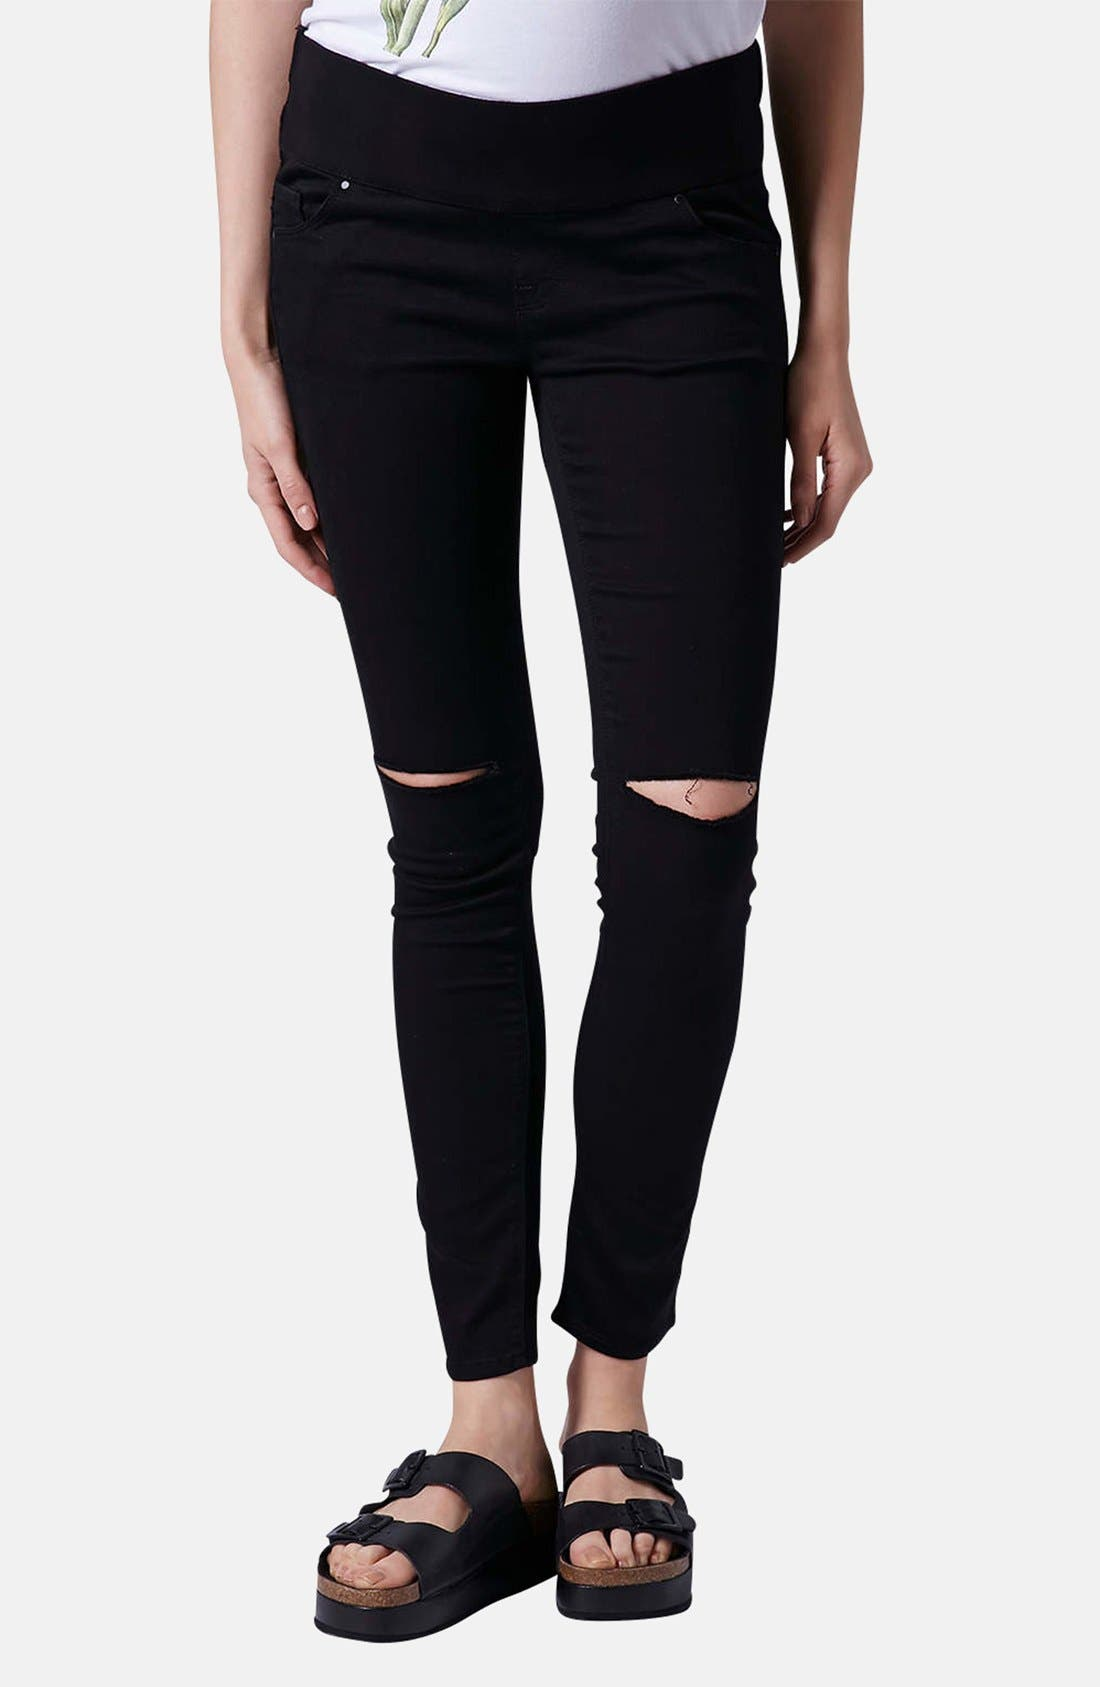 Alternate Image 1 Selected - Topshop Moto 'Leigh' Ripped Maternity Jeans (Black) (Regular, Short & Long)